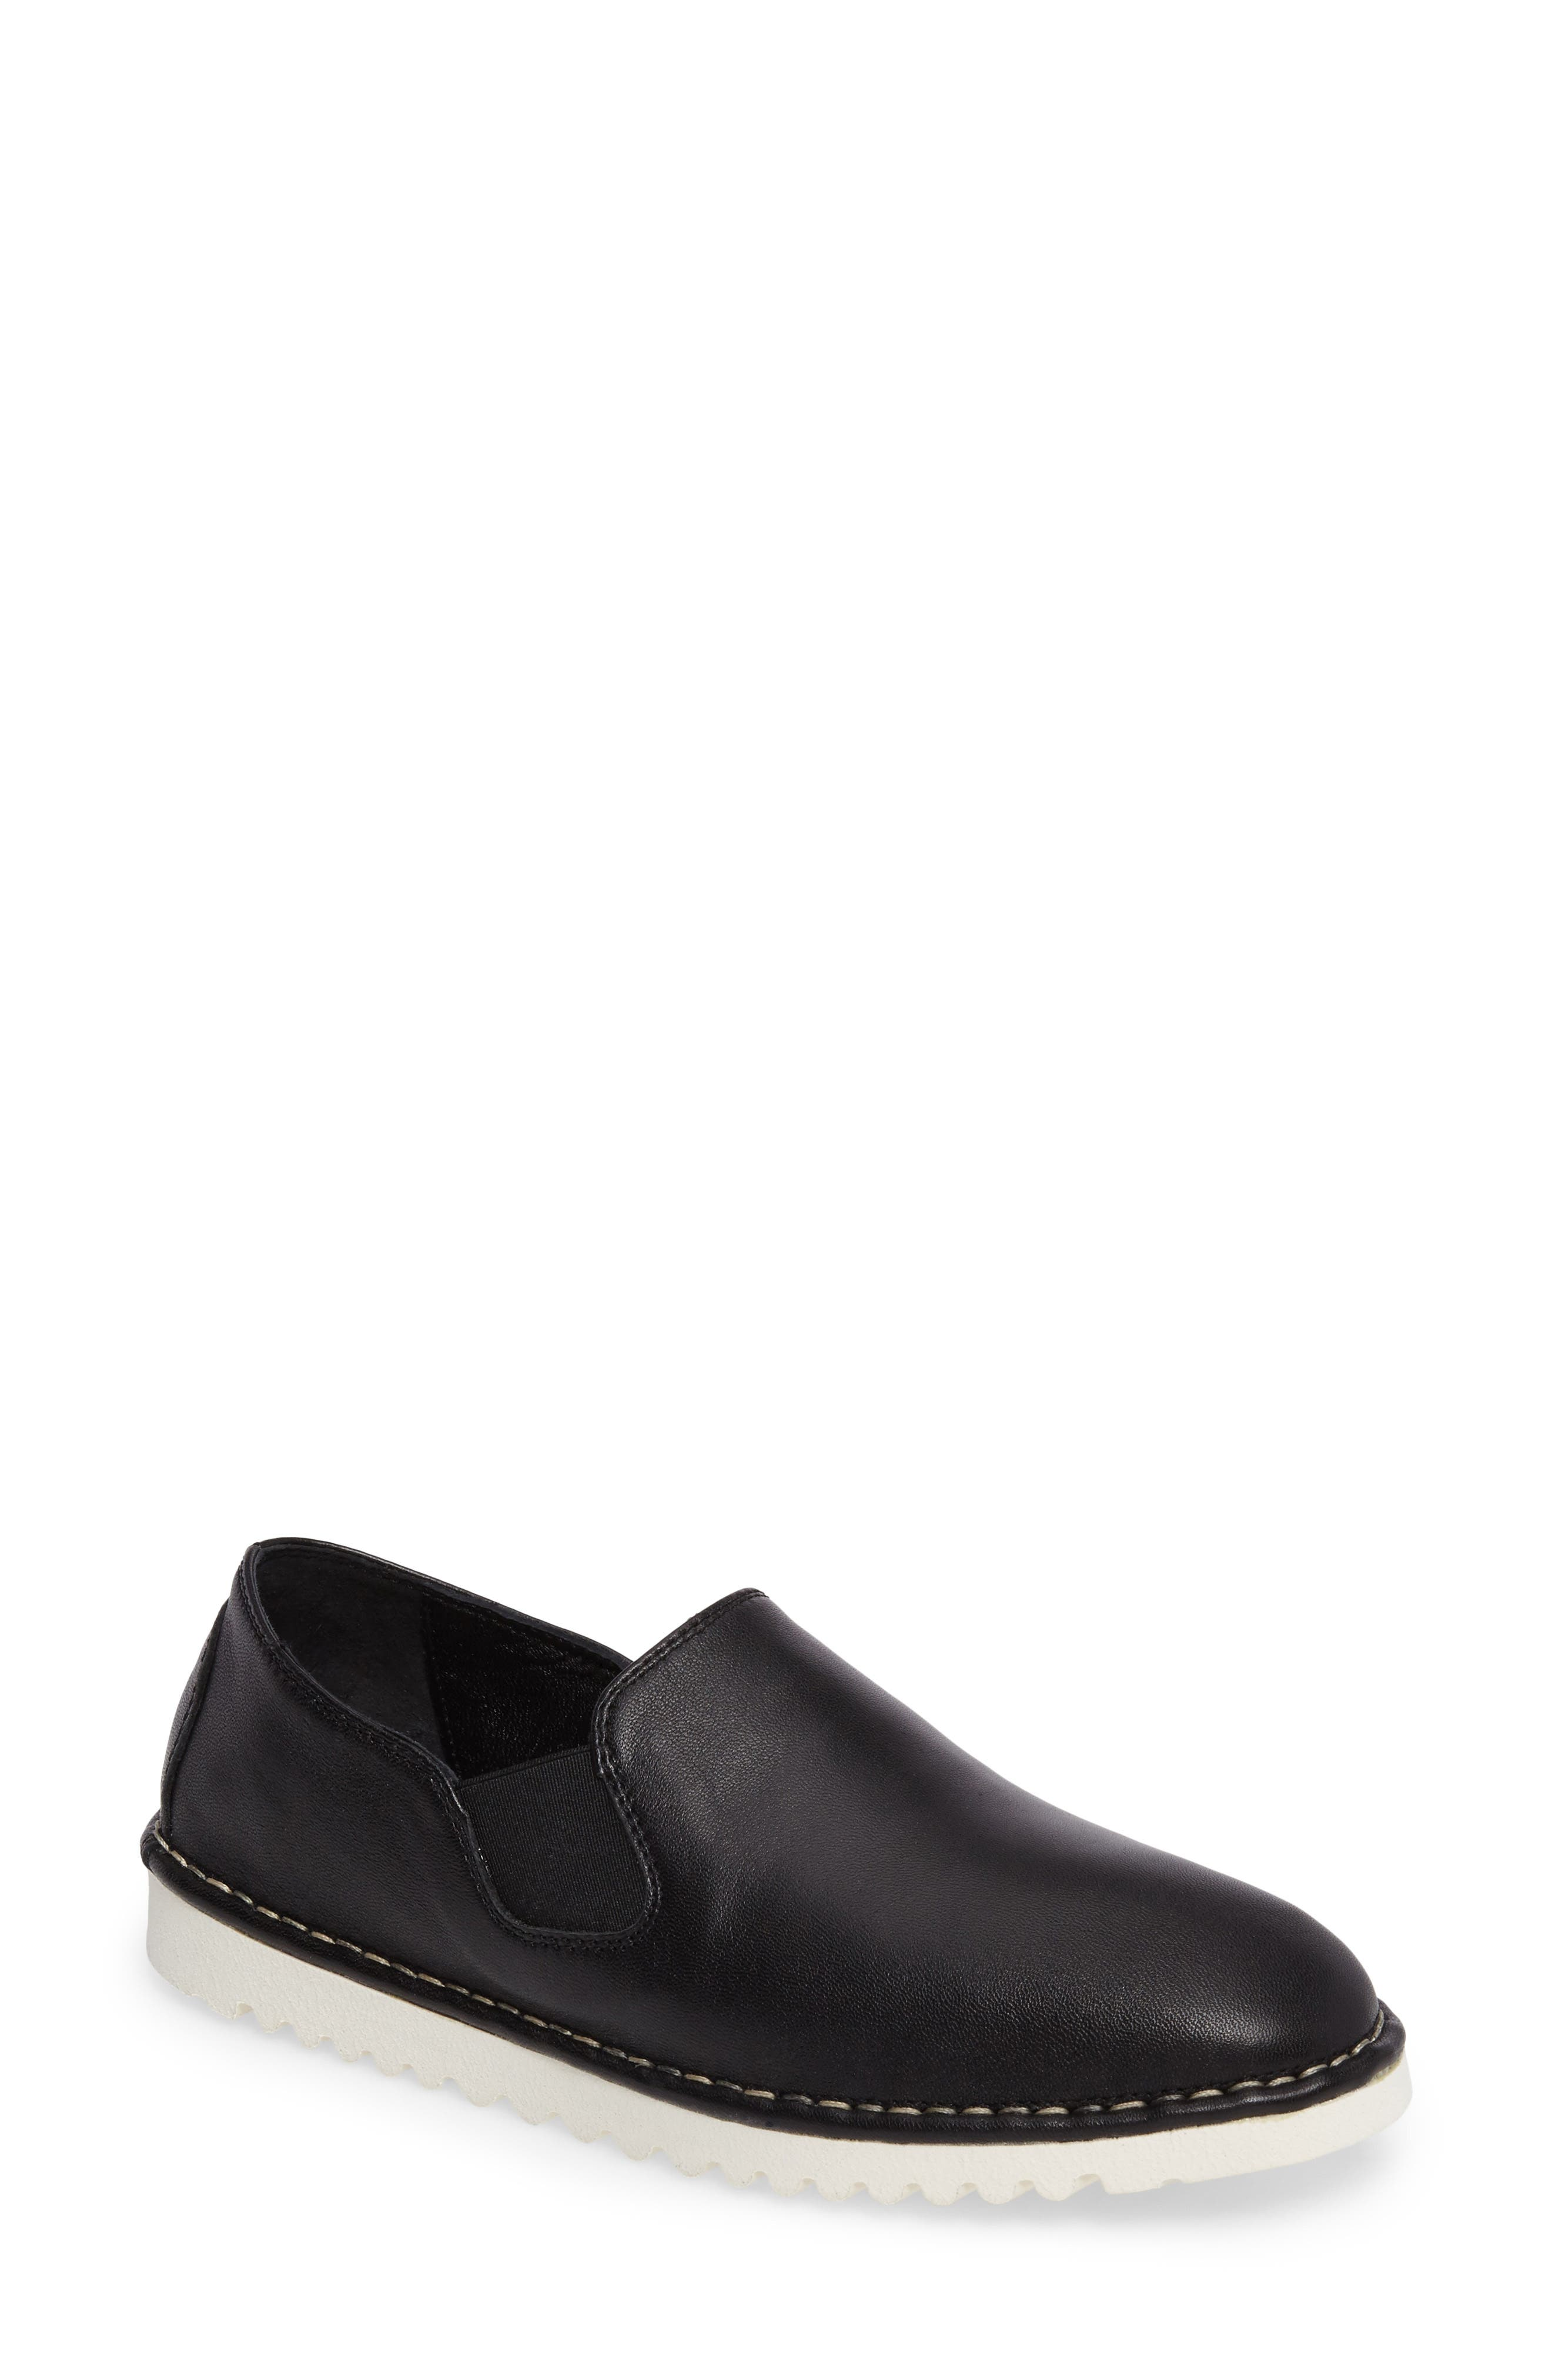 Main Image - Sesto Meucci Oralie Slip-On Sneaker (Women)